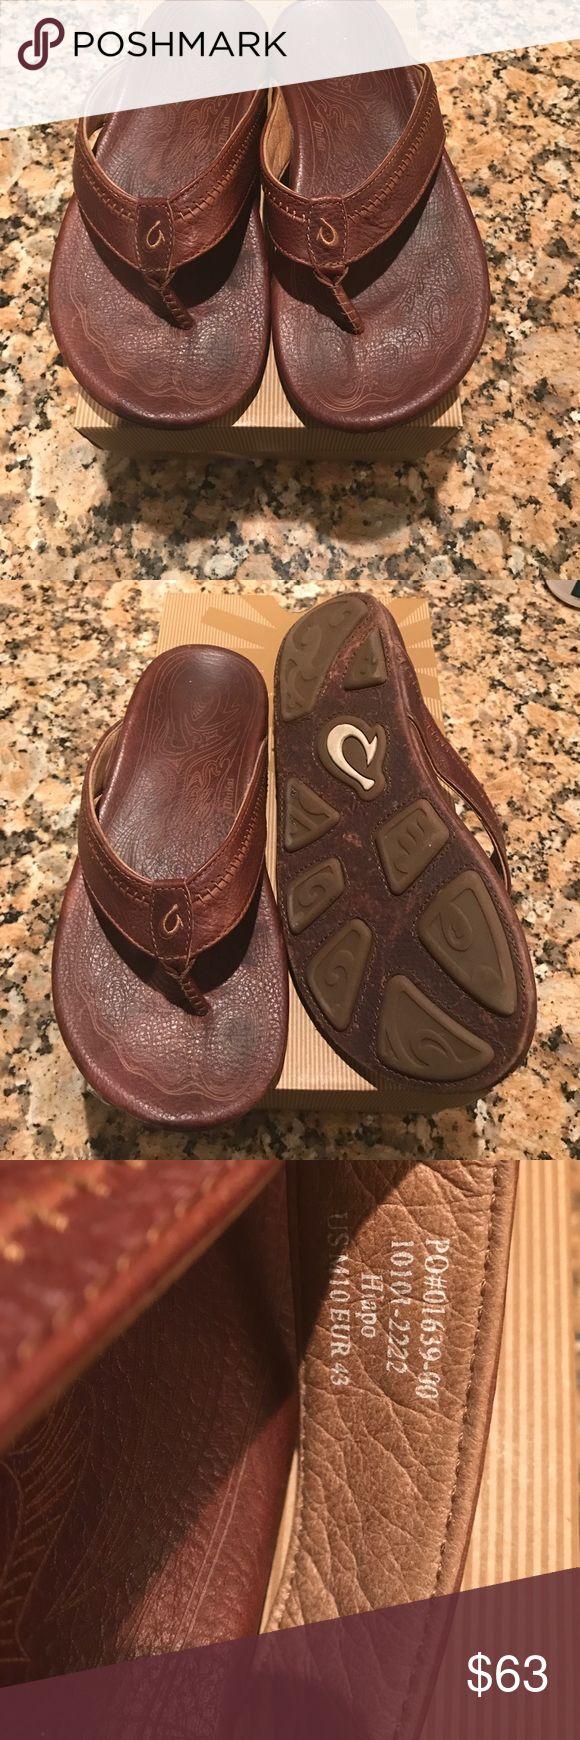 Olukai leather flip flops Hiapo size 10 OluKai Shoes Sandals & Flip-Flops